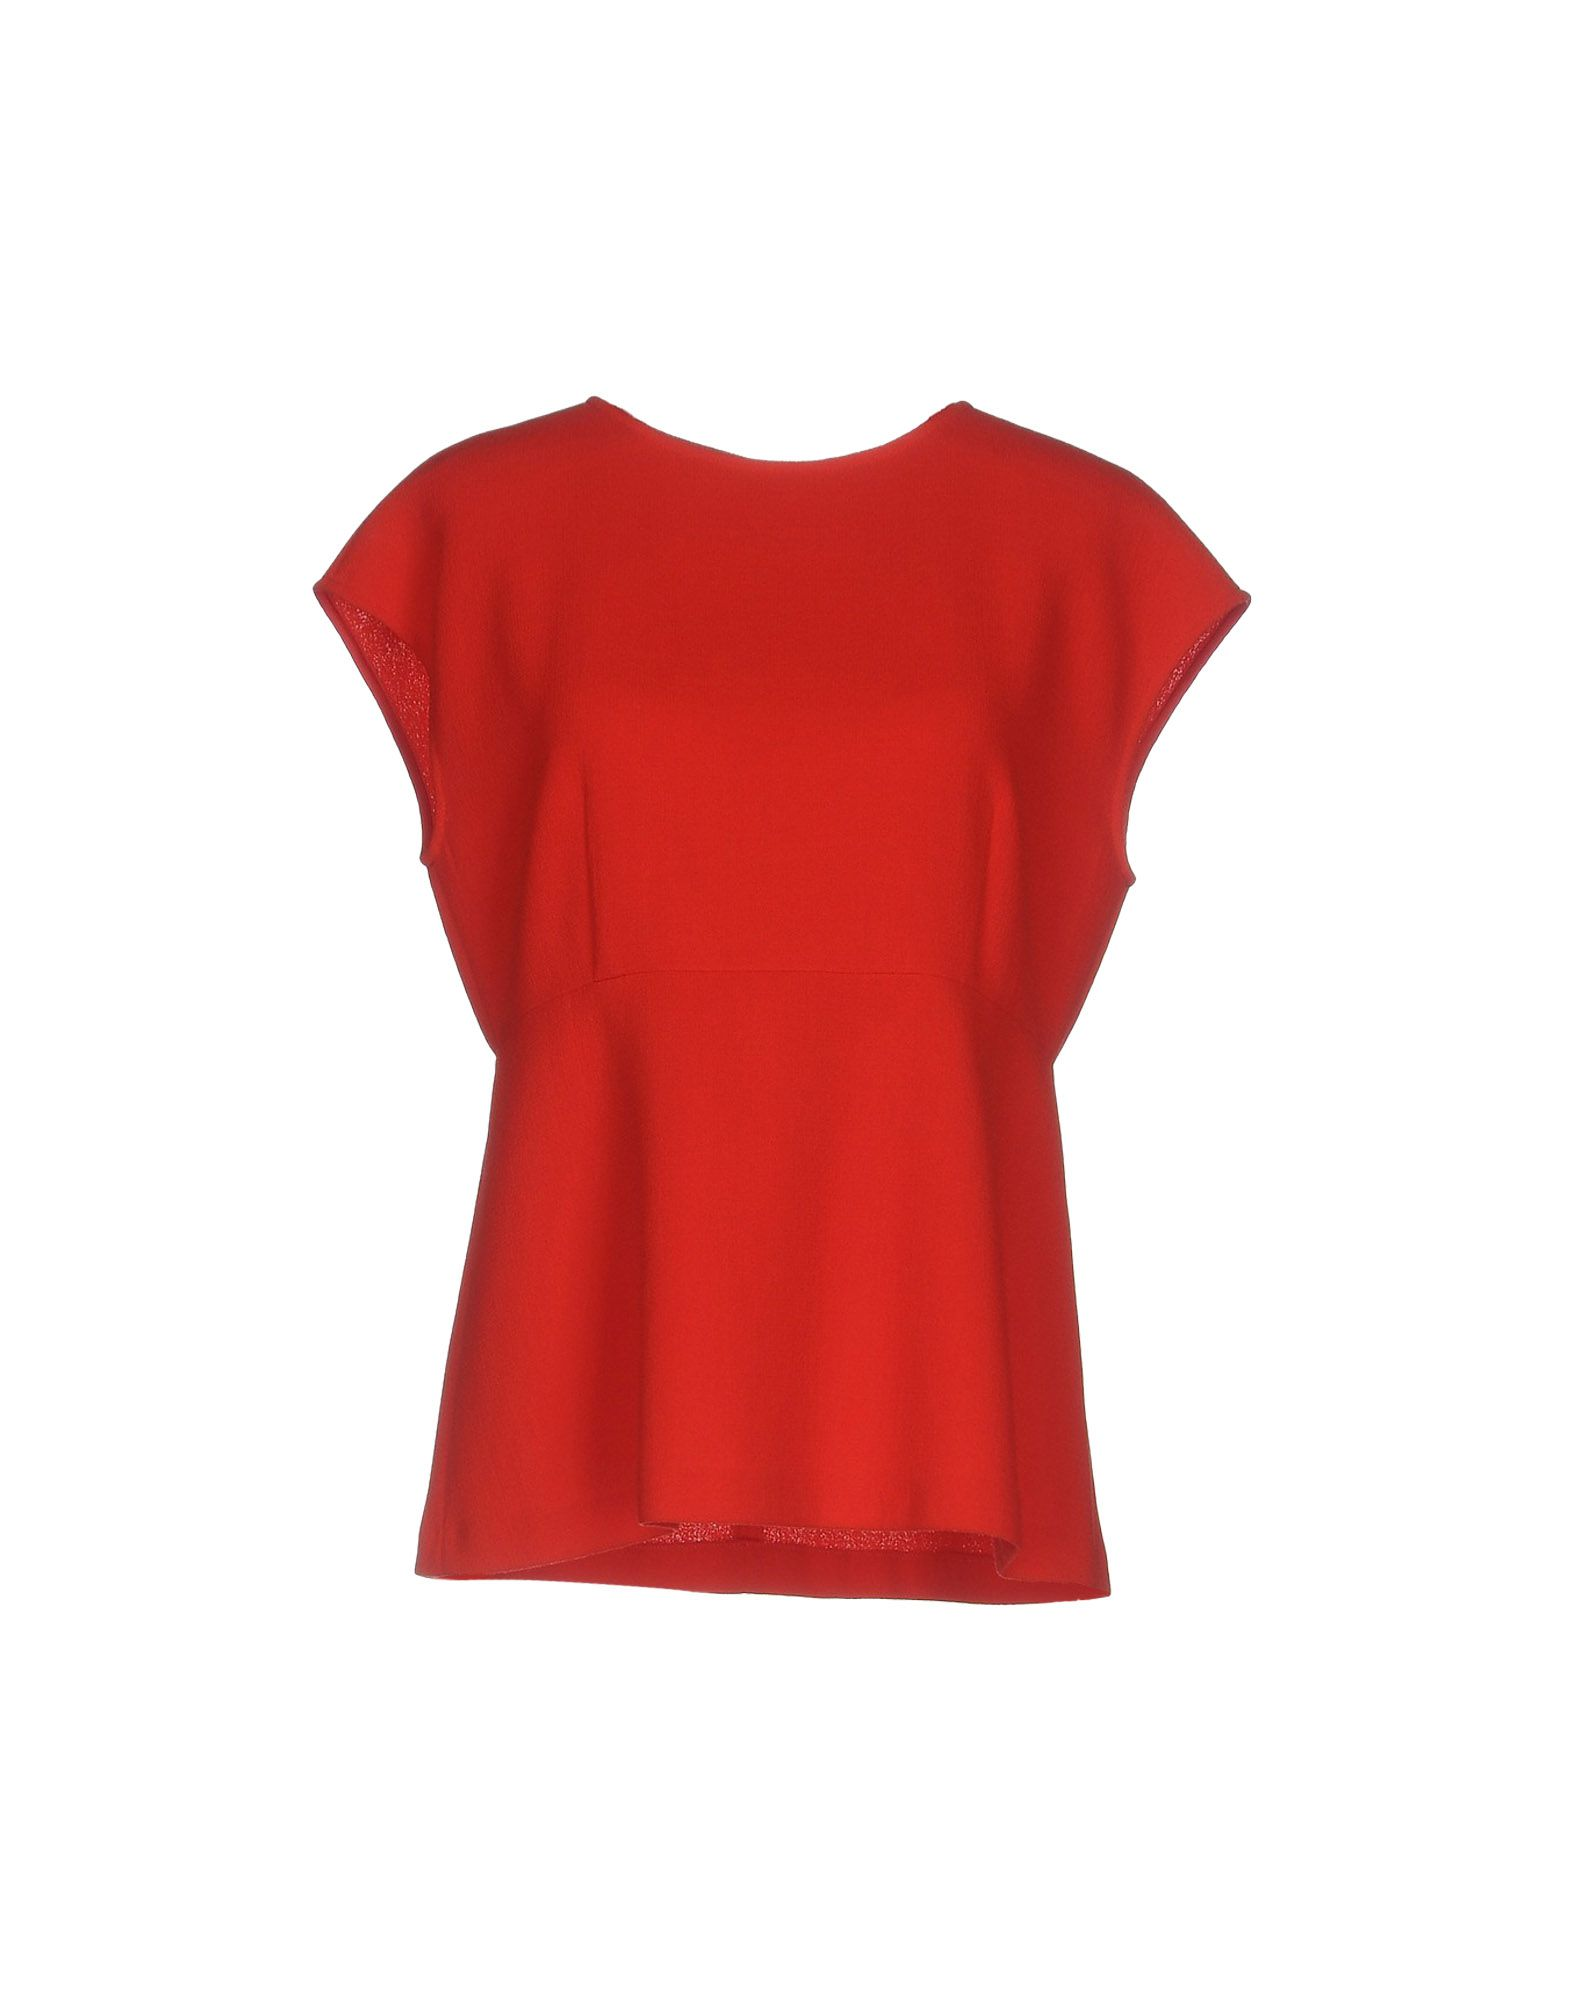 Top L' Autre Chose Donna - Acquista online su y6lIoDgpU5